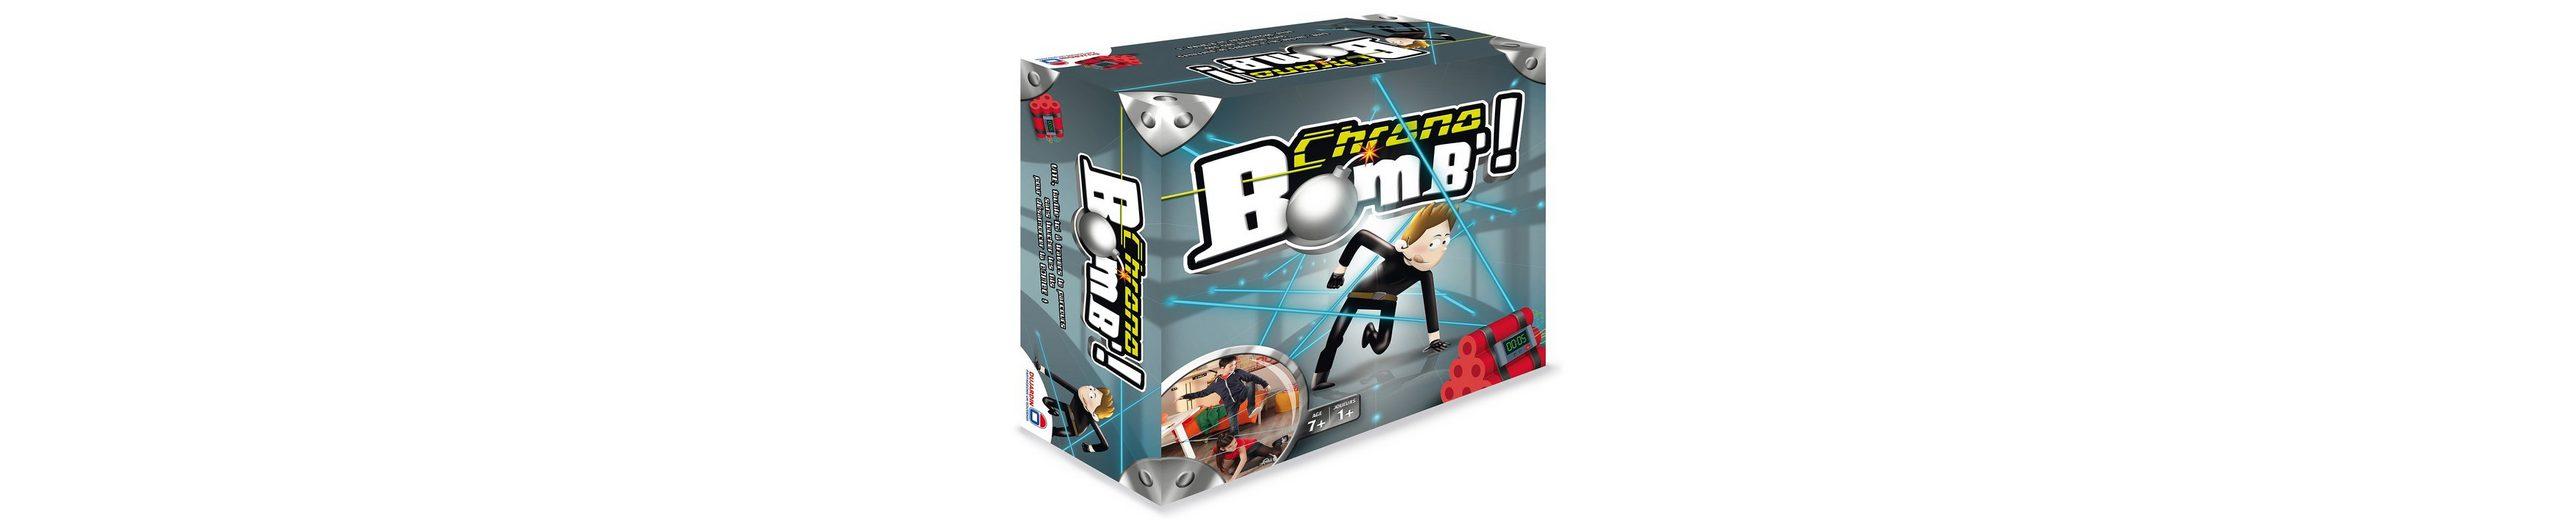 IMC Toys Geschicklichkeitsspiel, »Chrono Bomb«